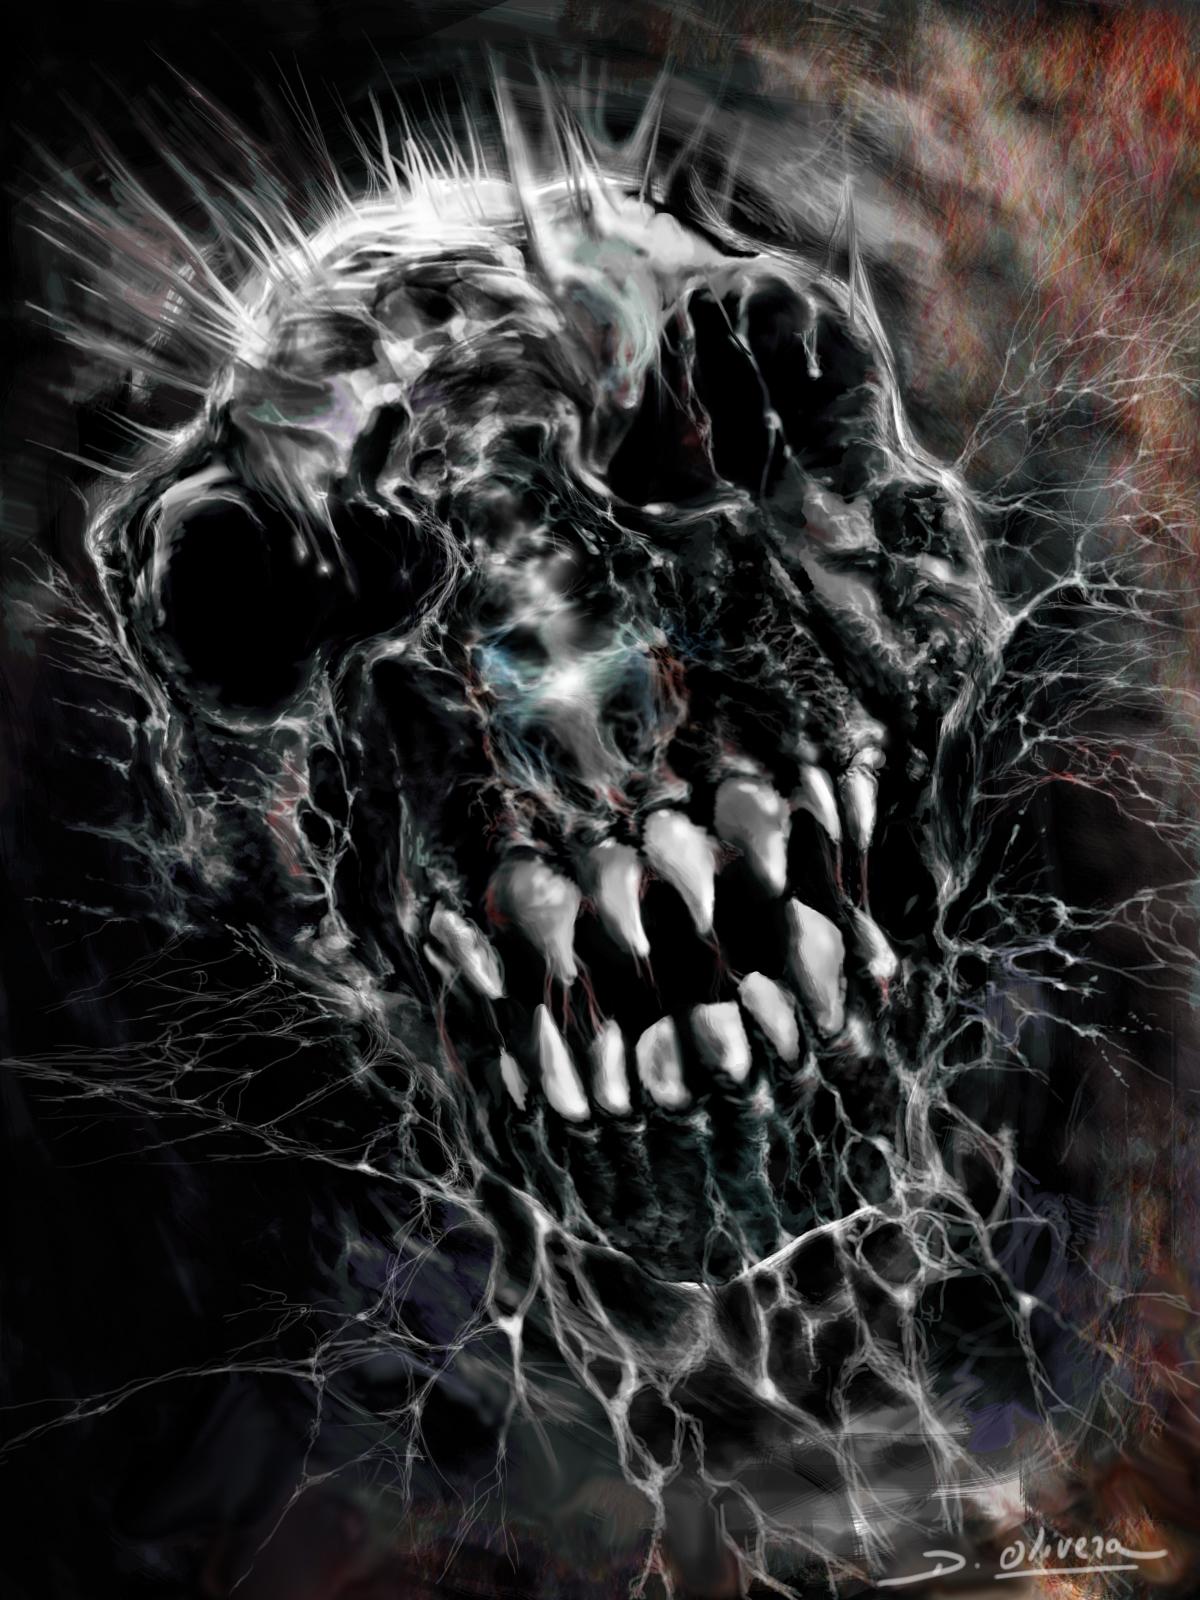 BLACK METAL Black_metal_storm__concept_i__by_danielolivera-d53cnw0